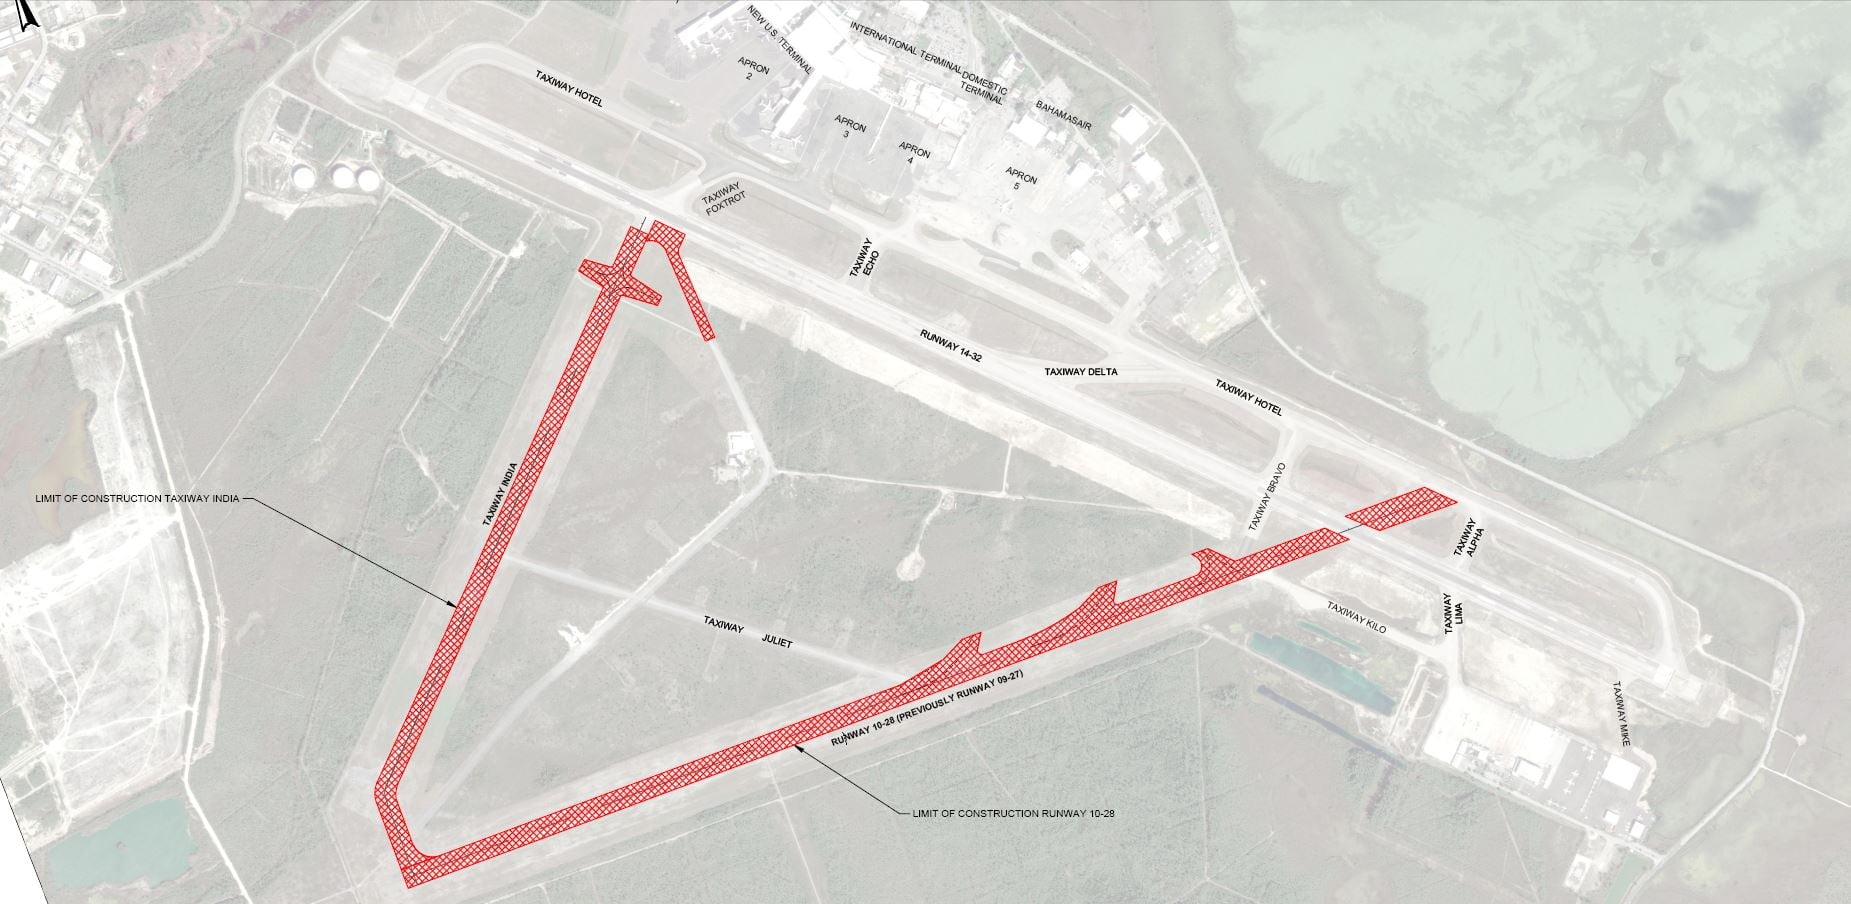 LPIA to begin $20M Runway Rehabilitation Project on June 17